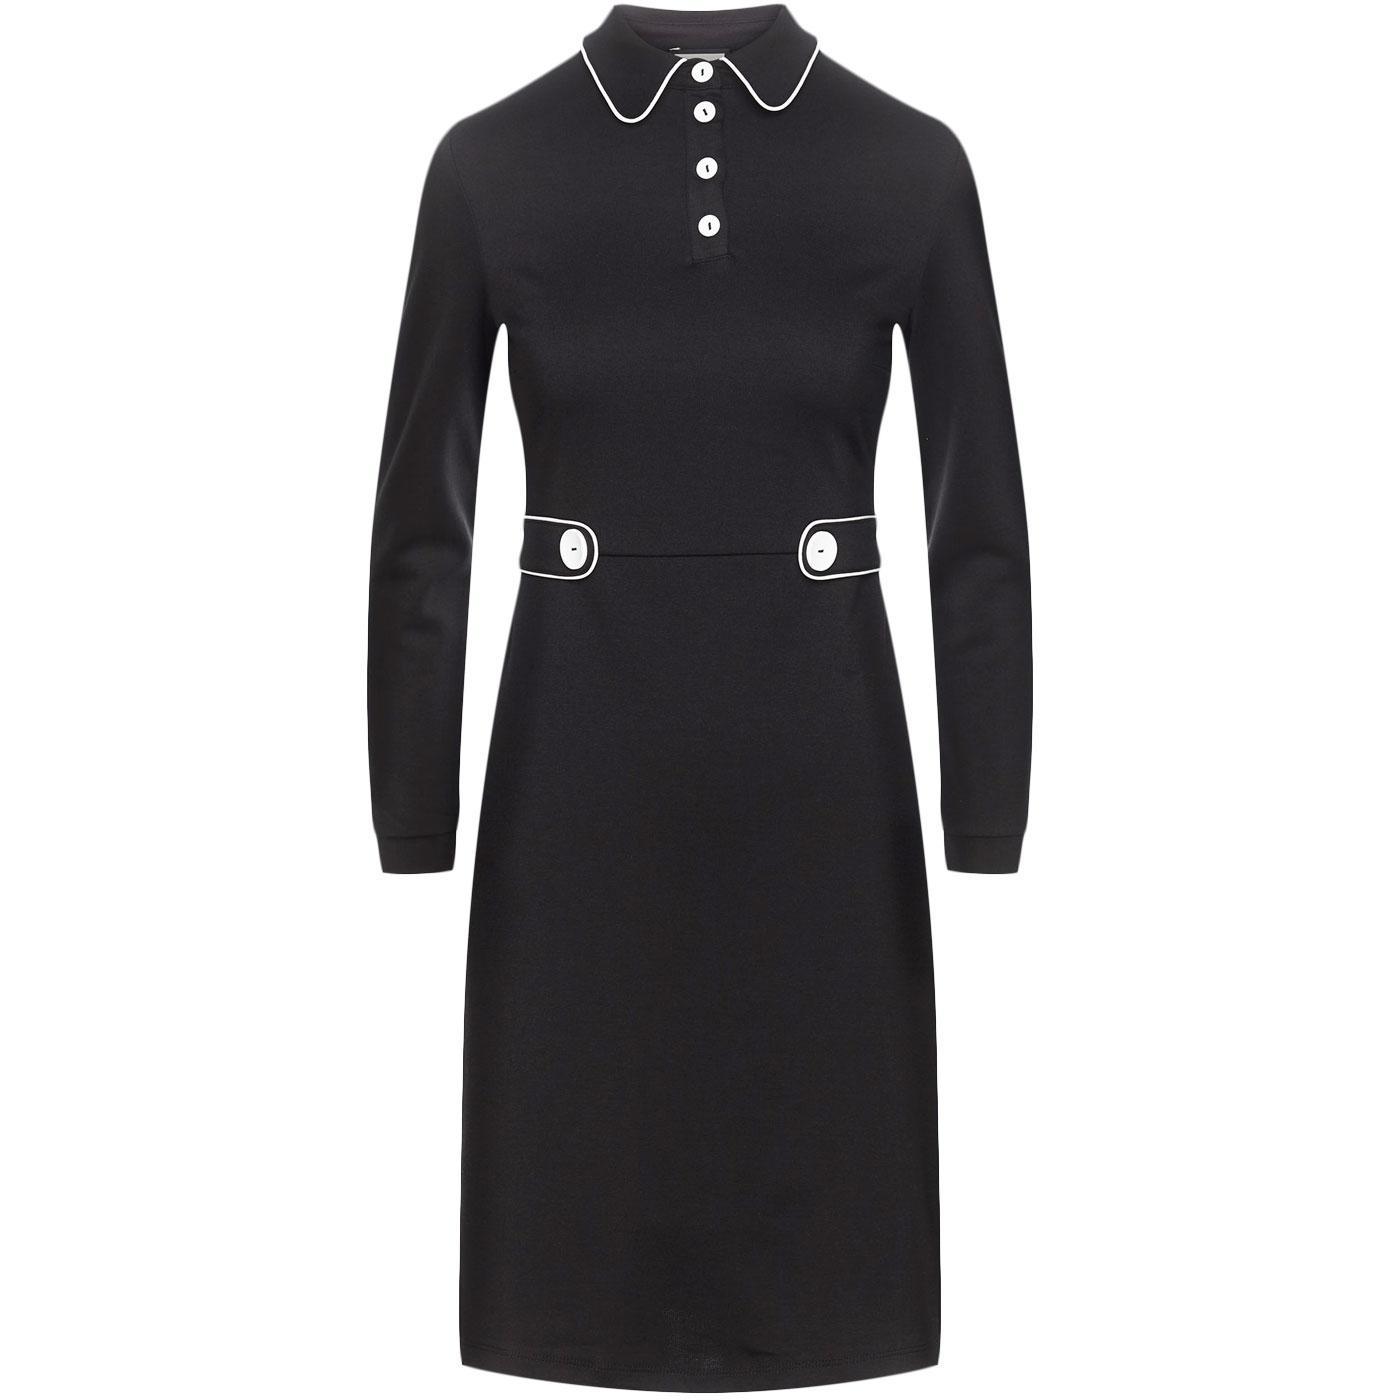 There She Goes MADEMOISELLE YEYE 60s Mod Dress